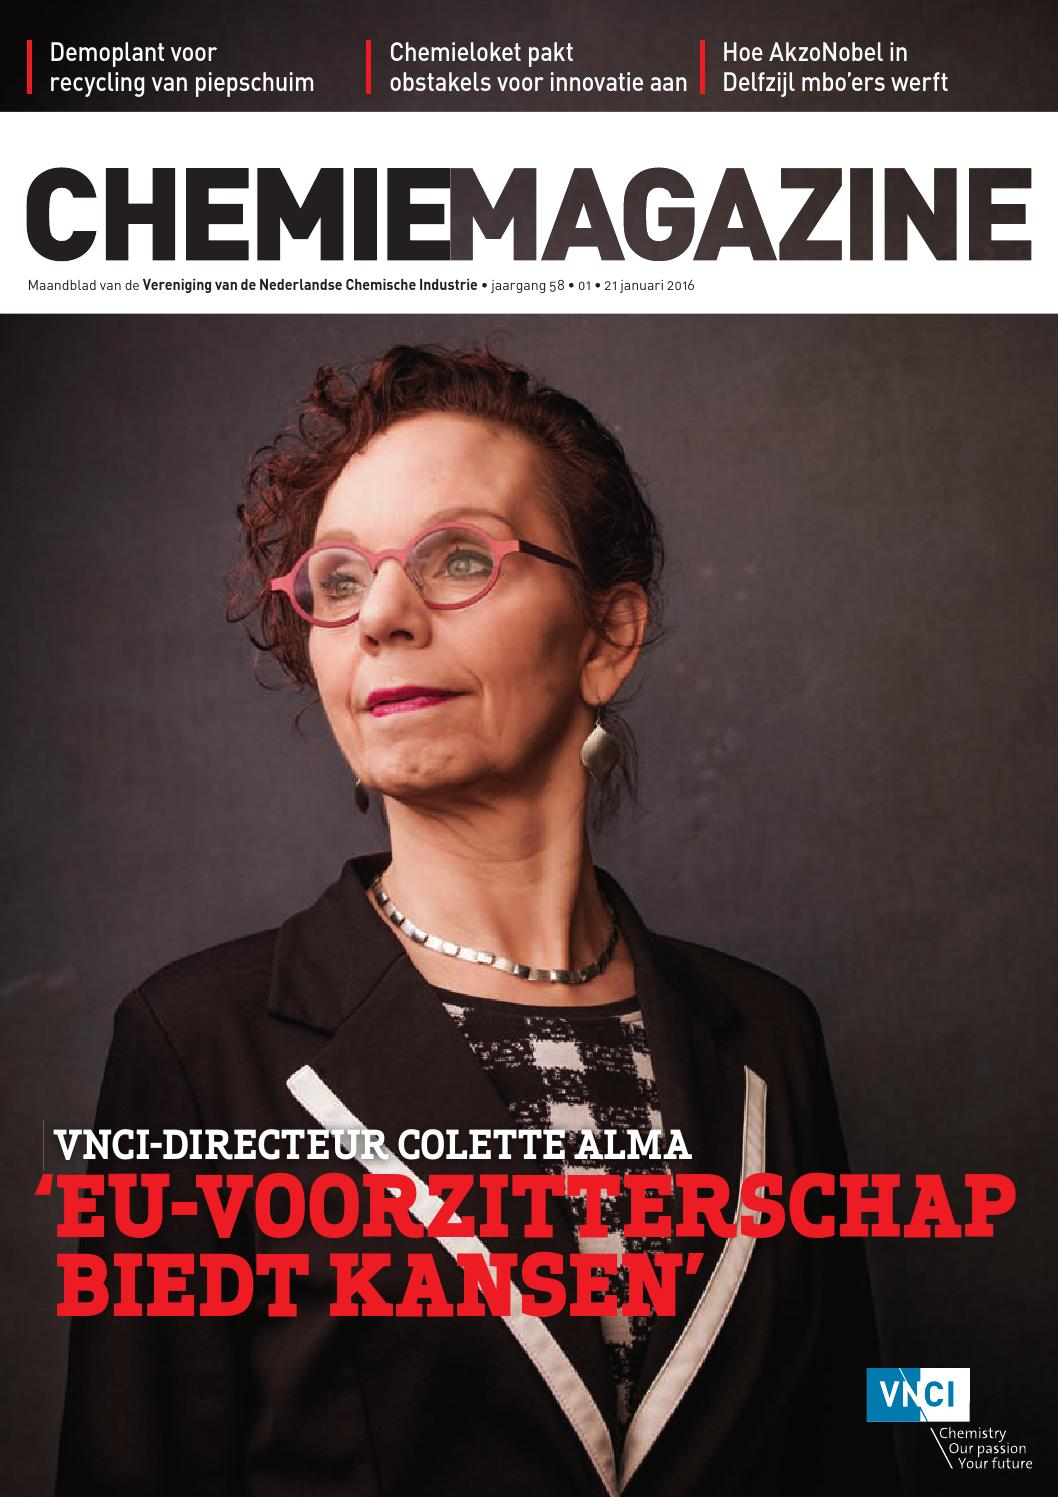 Chemie Magazine - januari 2016 by VNCI - issuu